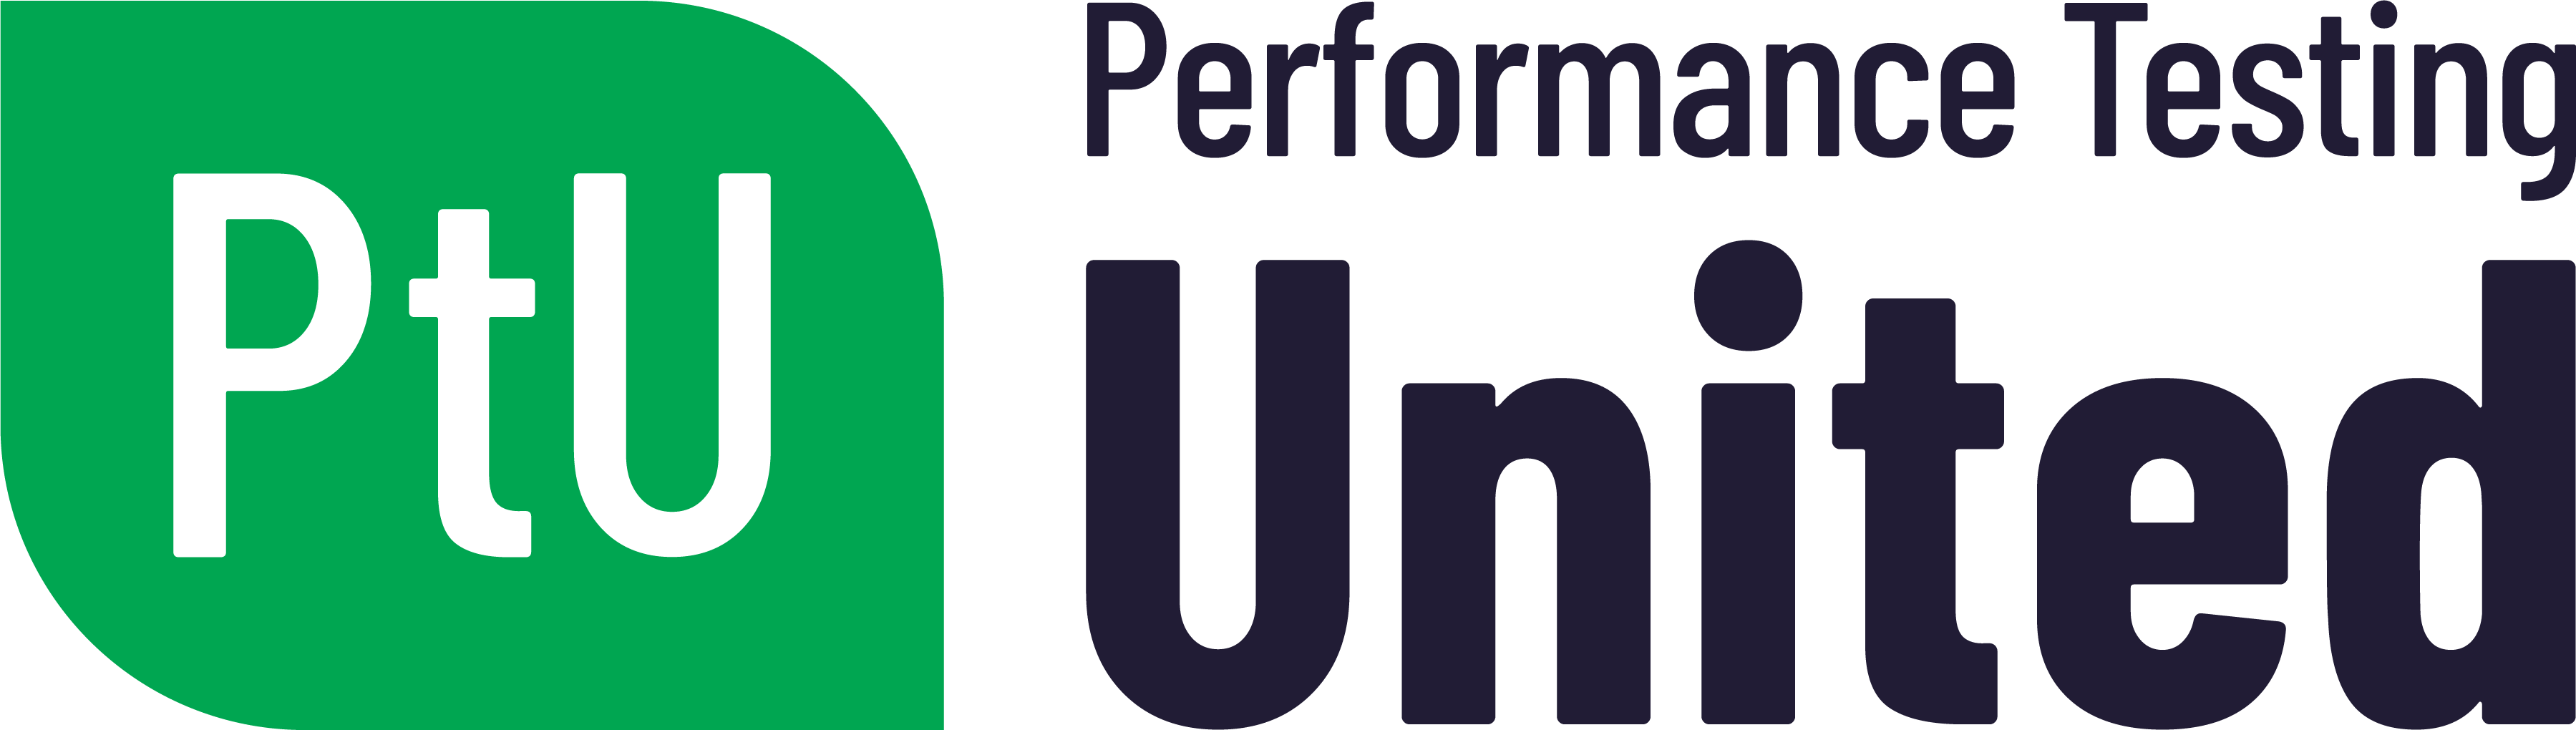 PtU-CPTJM-logo